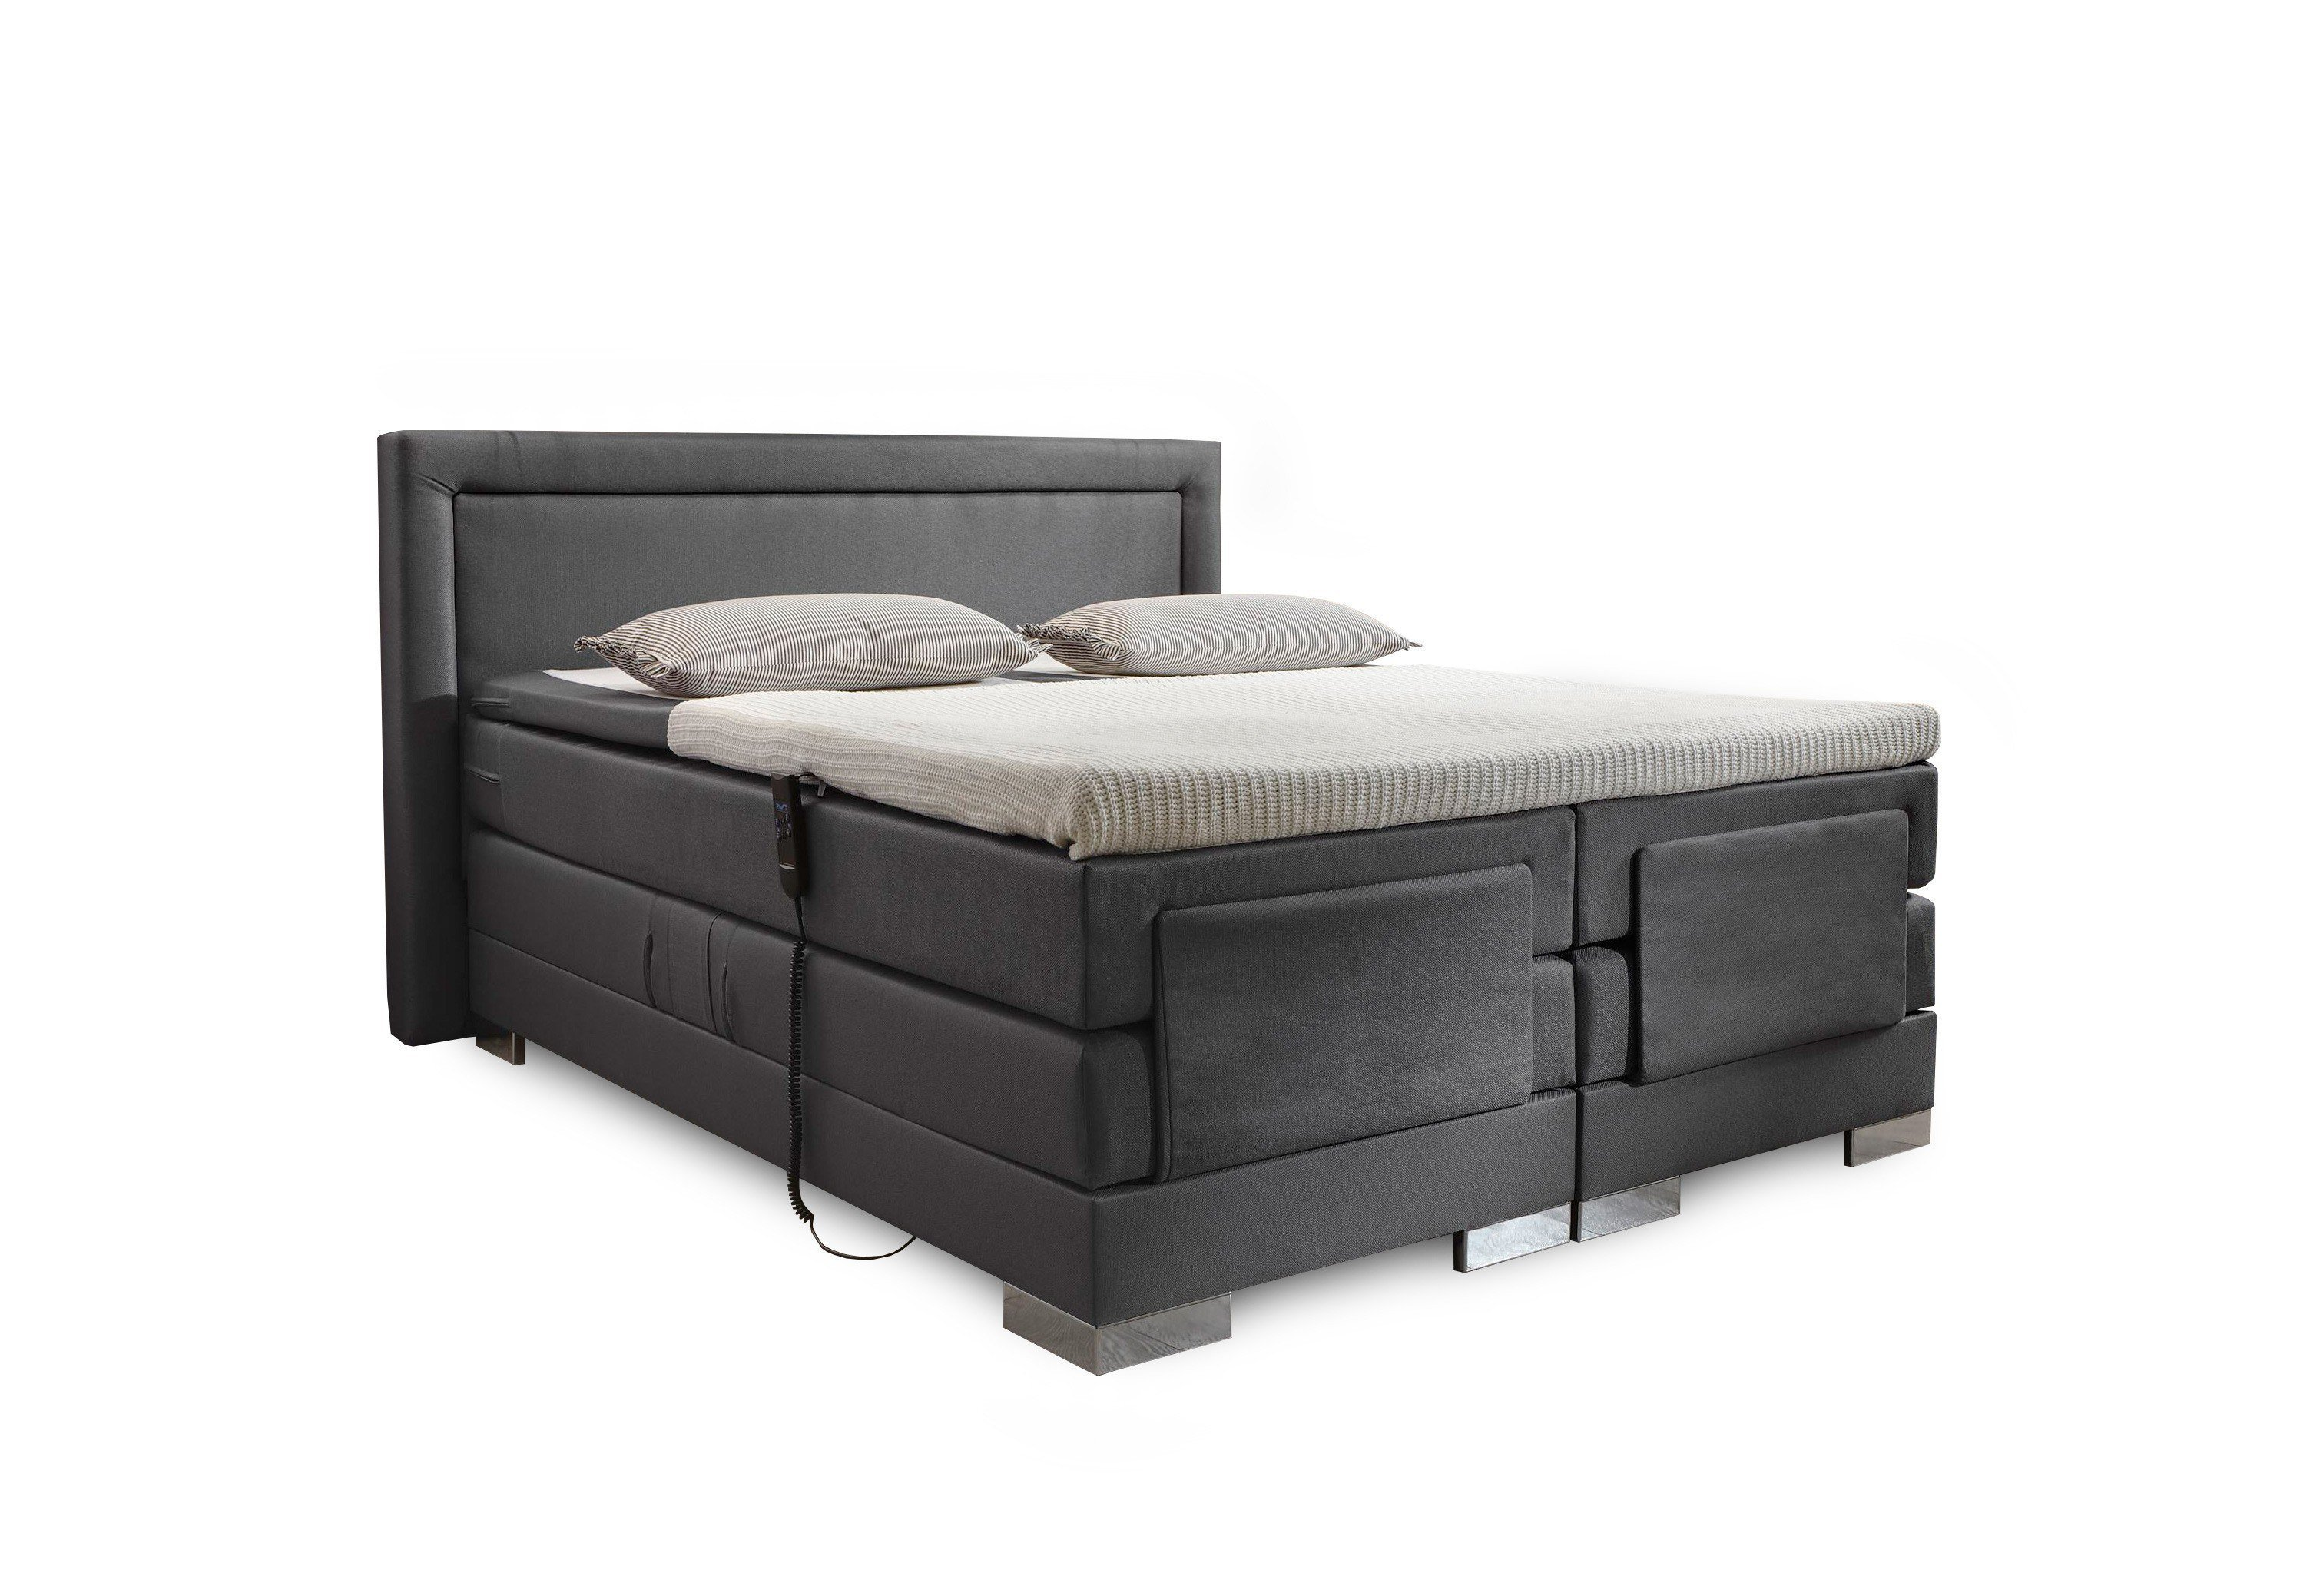 dico m bel bs9030 boxspringbett mit motor m bel letz. Black Bedroom Furniture Sets. Home Design Ideas